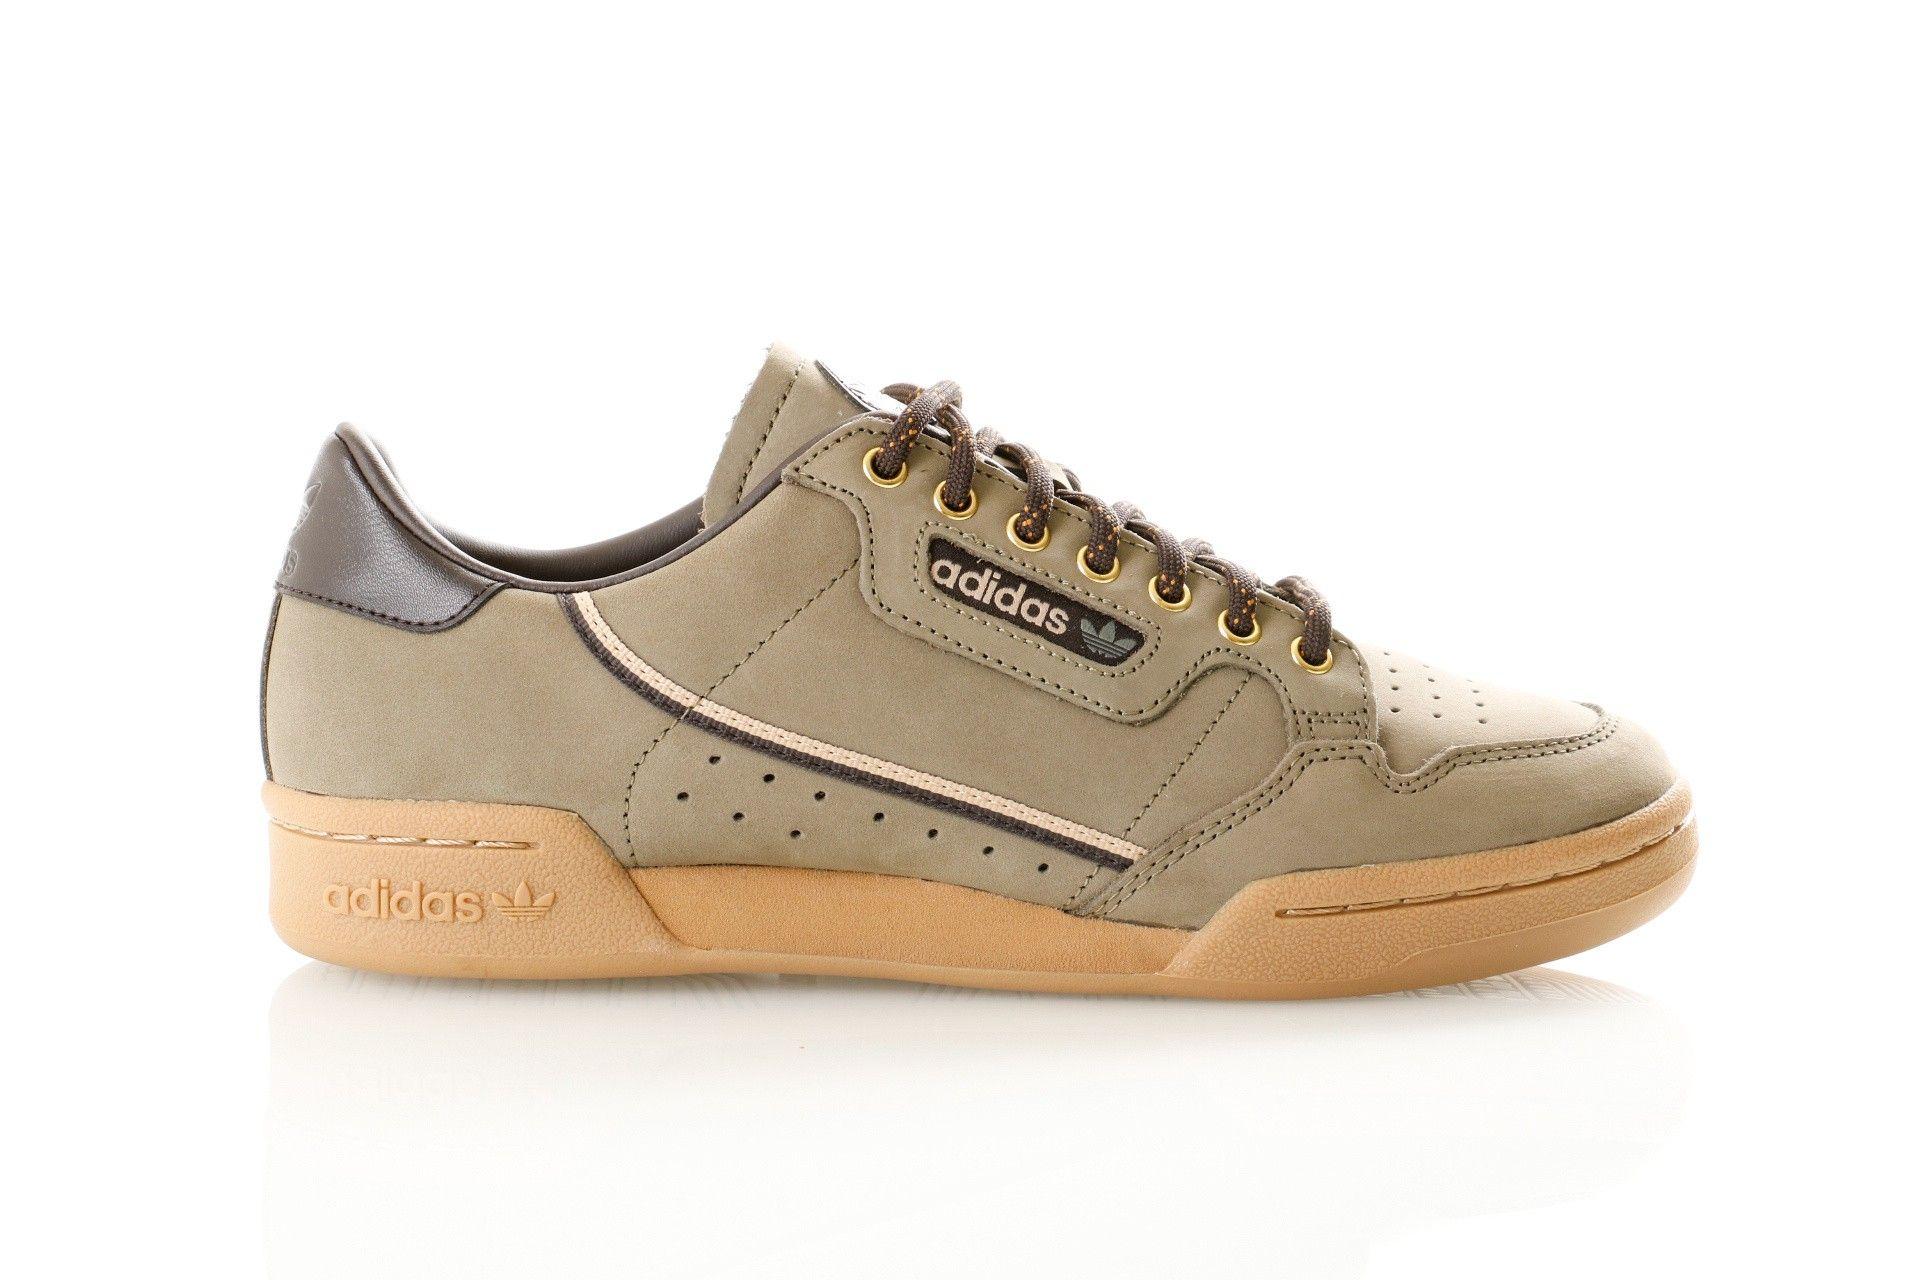 Afbeelding van Adidas Continental 80 Eg3099 Sneakers Tracar/Mesa/Nbrown